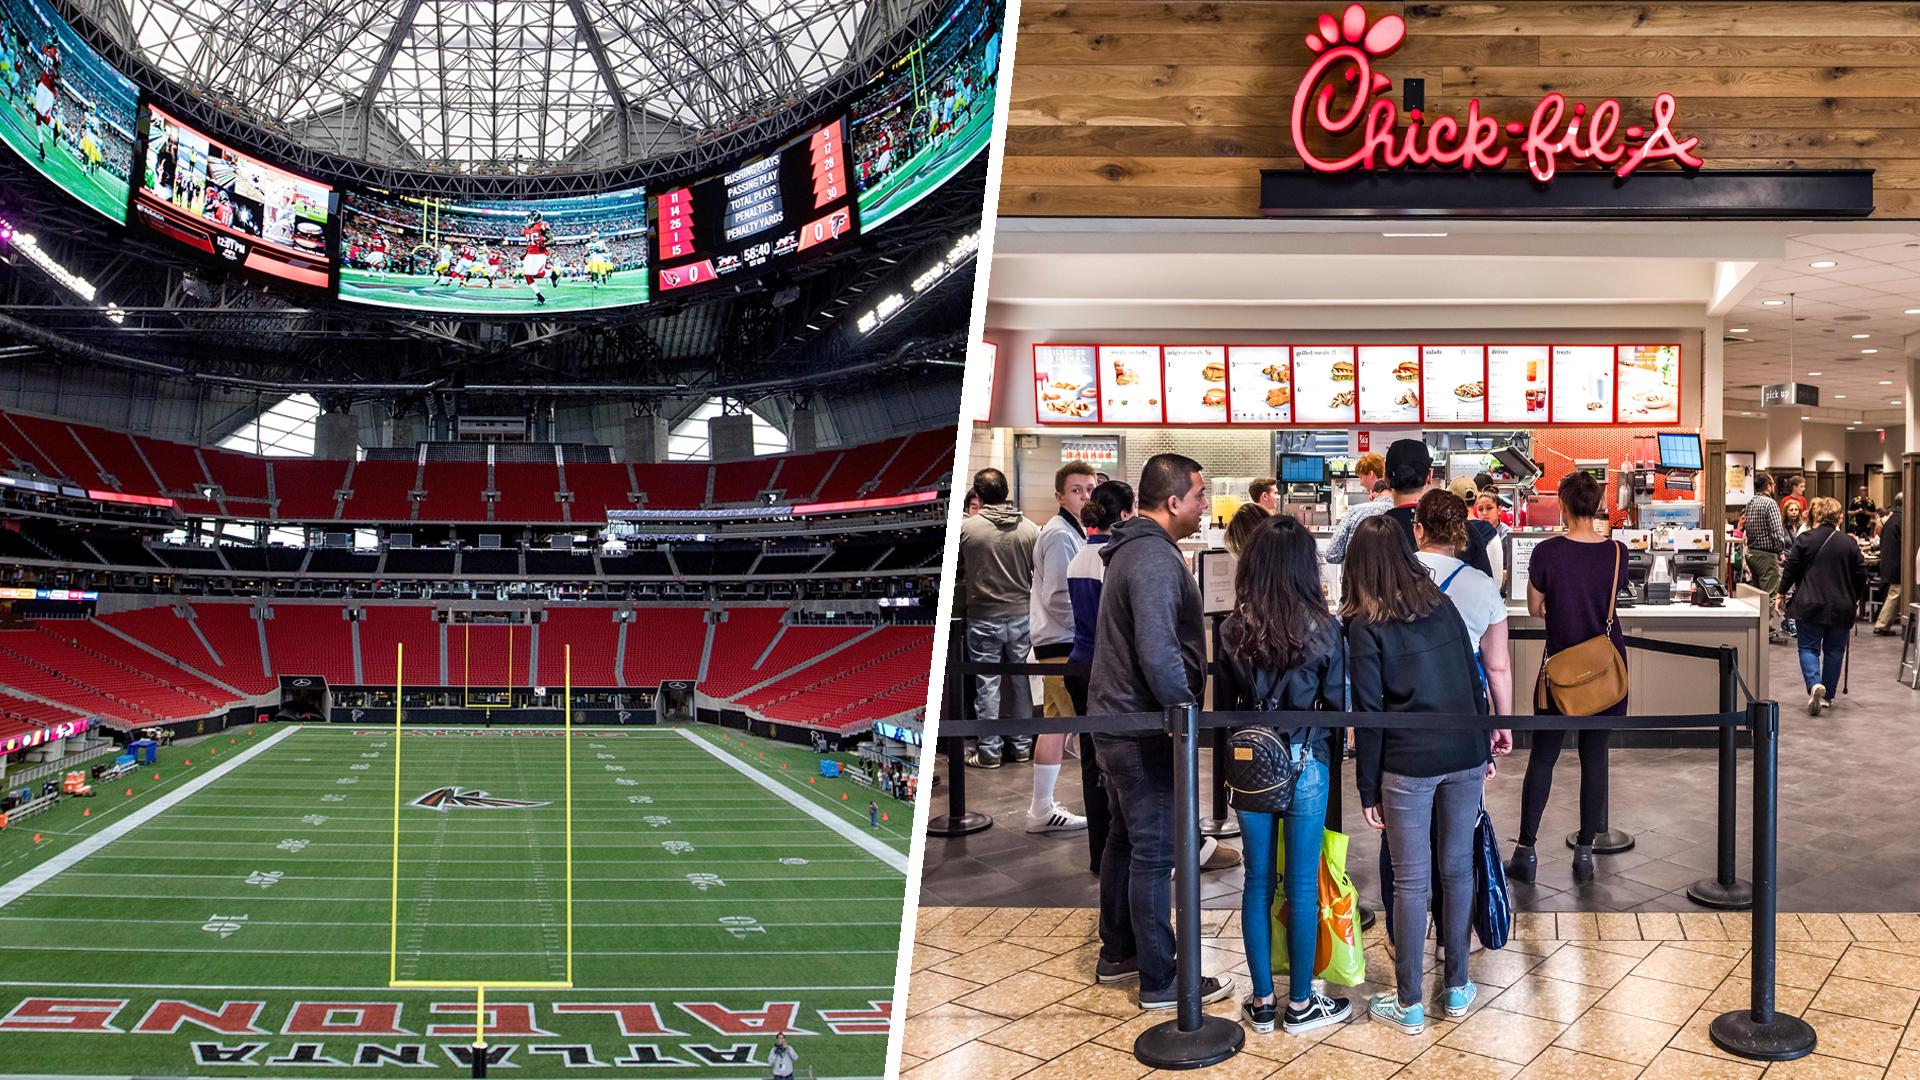 Chick fil a mercedes benz stadium atlanta closed for Dining at t stadium